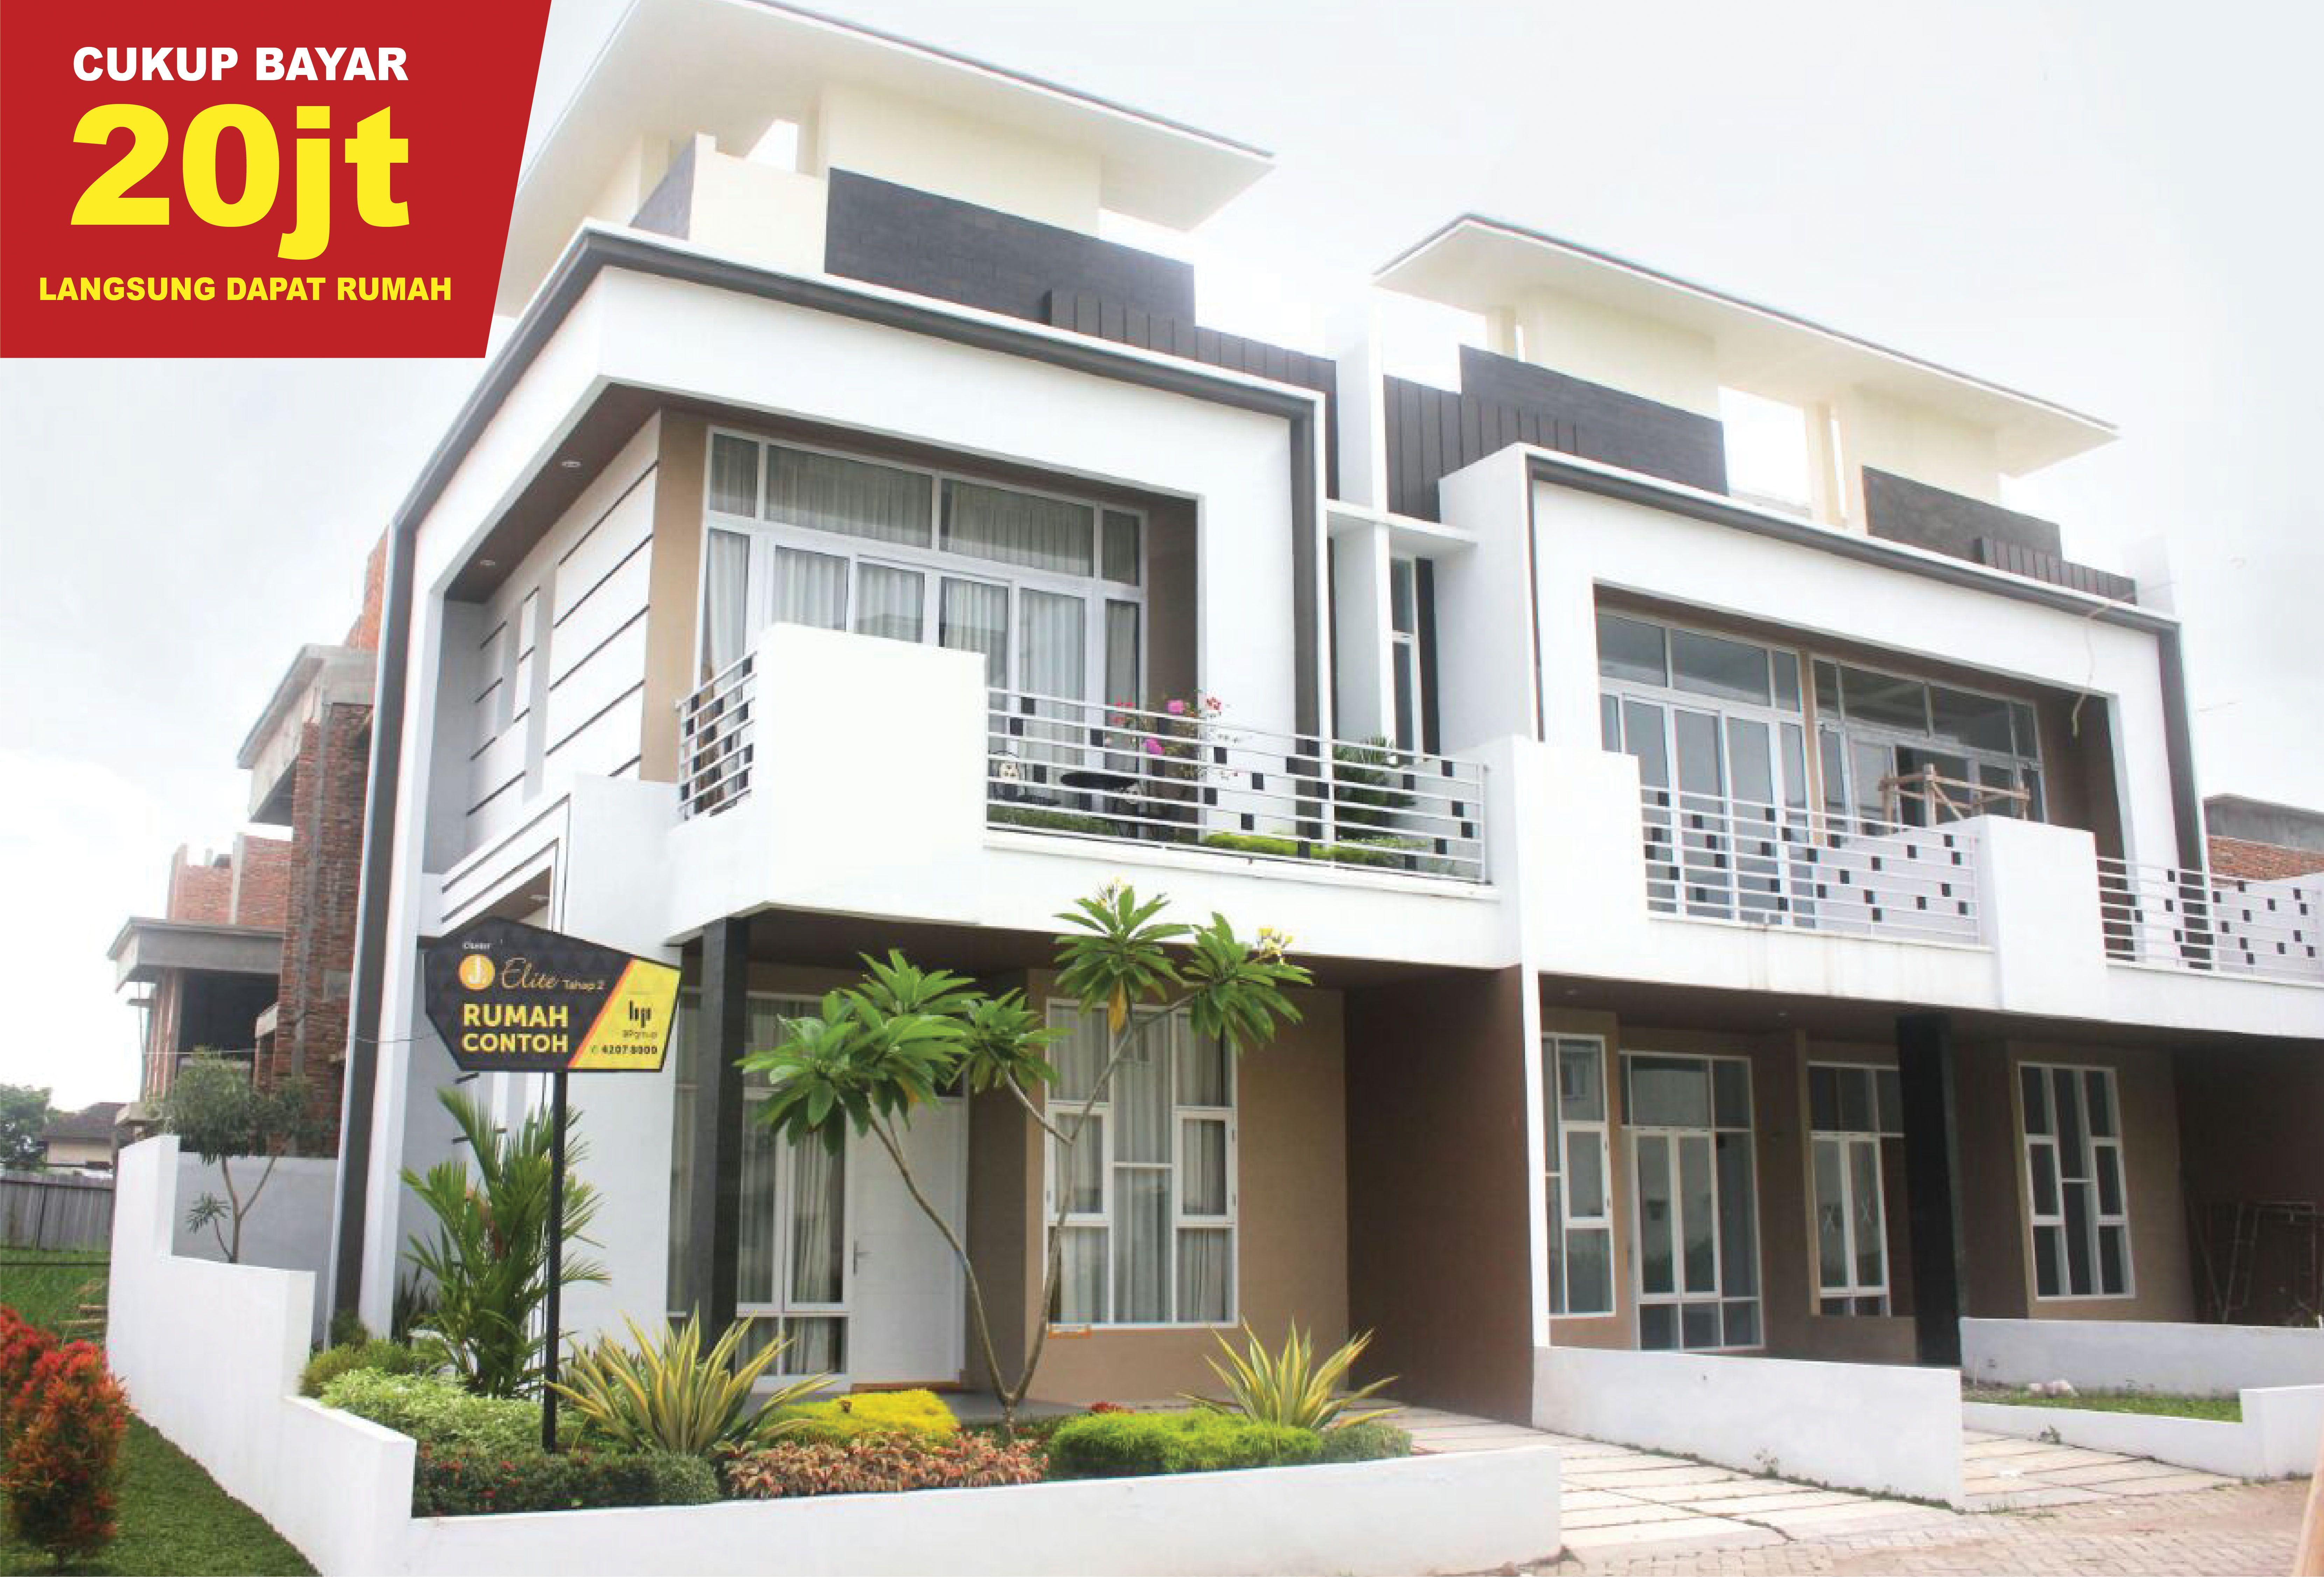 Jual Rumah Johor Bahru Medan Rumah J City Medan Johor Cari Rumah Di Medan Johor Rumah Medan Johor Dijual Rumah Di Medan Home Fashion Rumah Rumah Minimalis